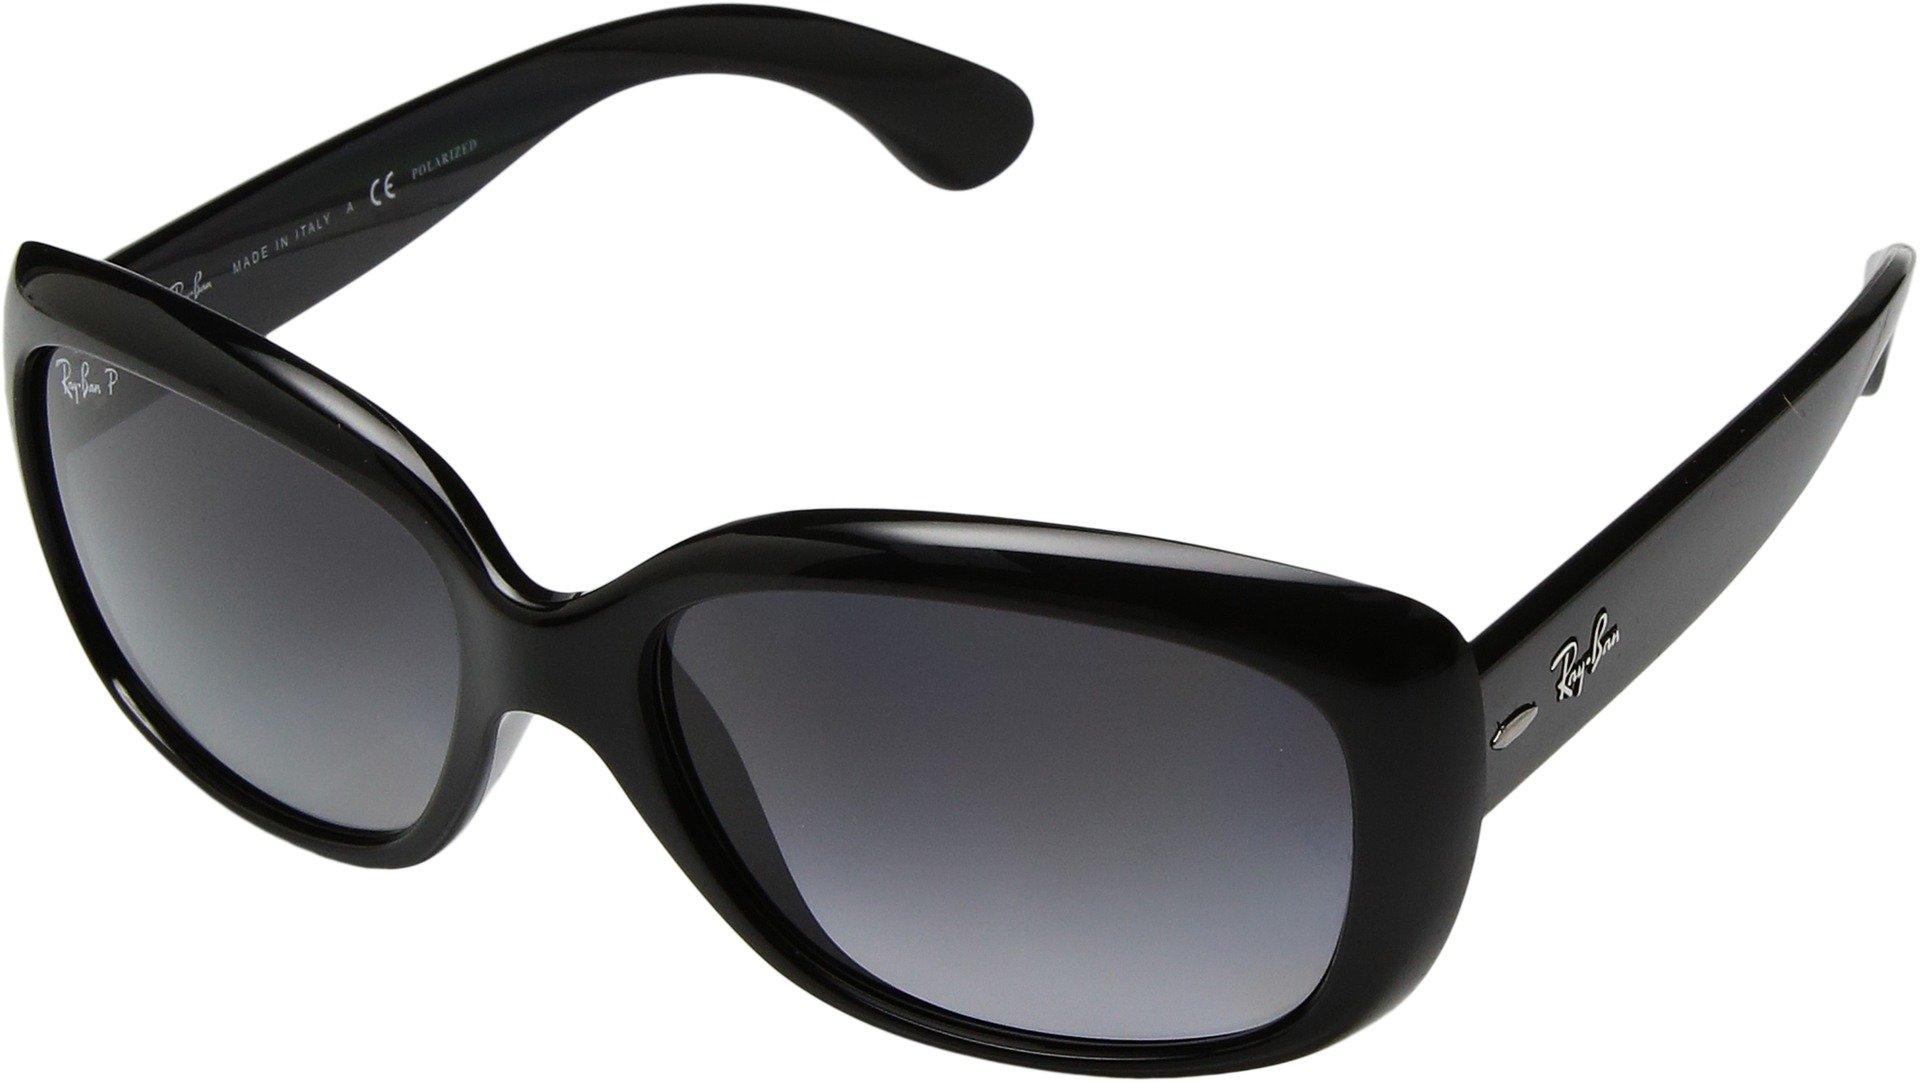 Ray-Ban Womens Sunglasses Black/Grey Plastic - Polarized - 58mm